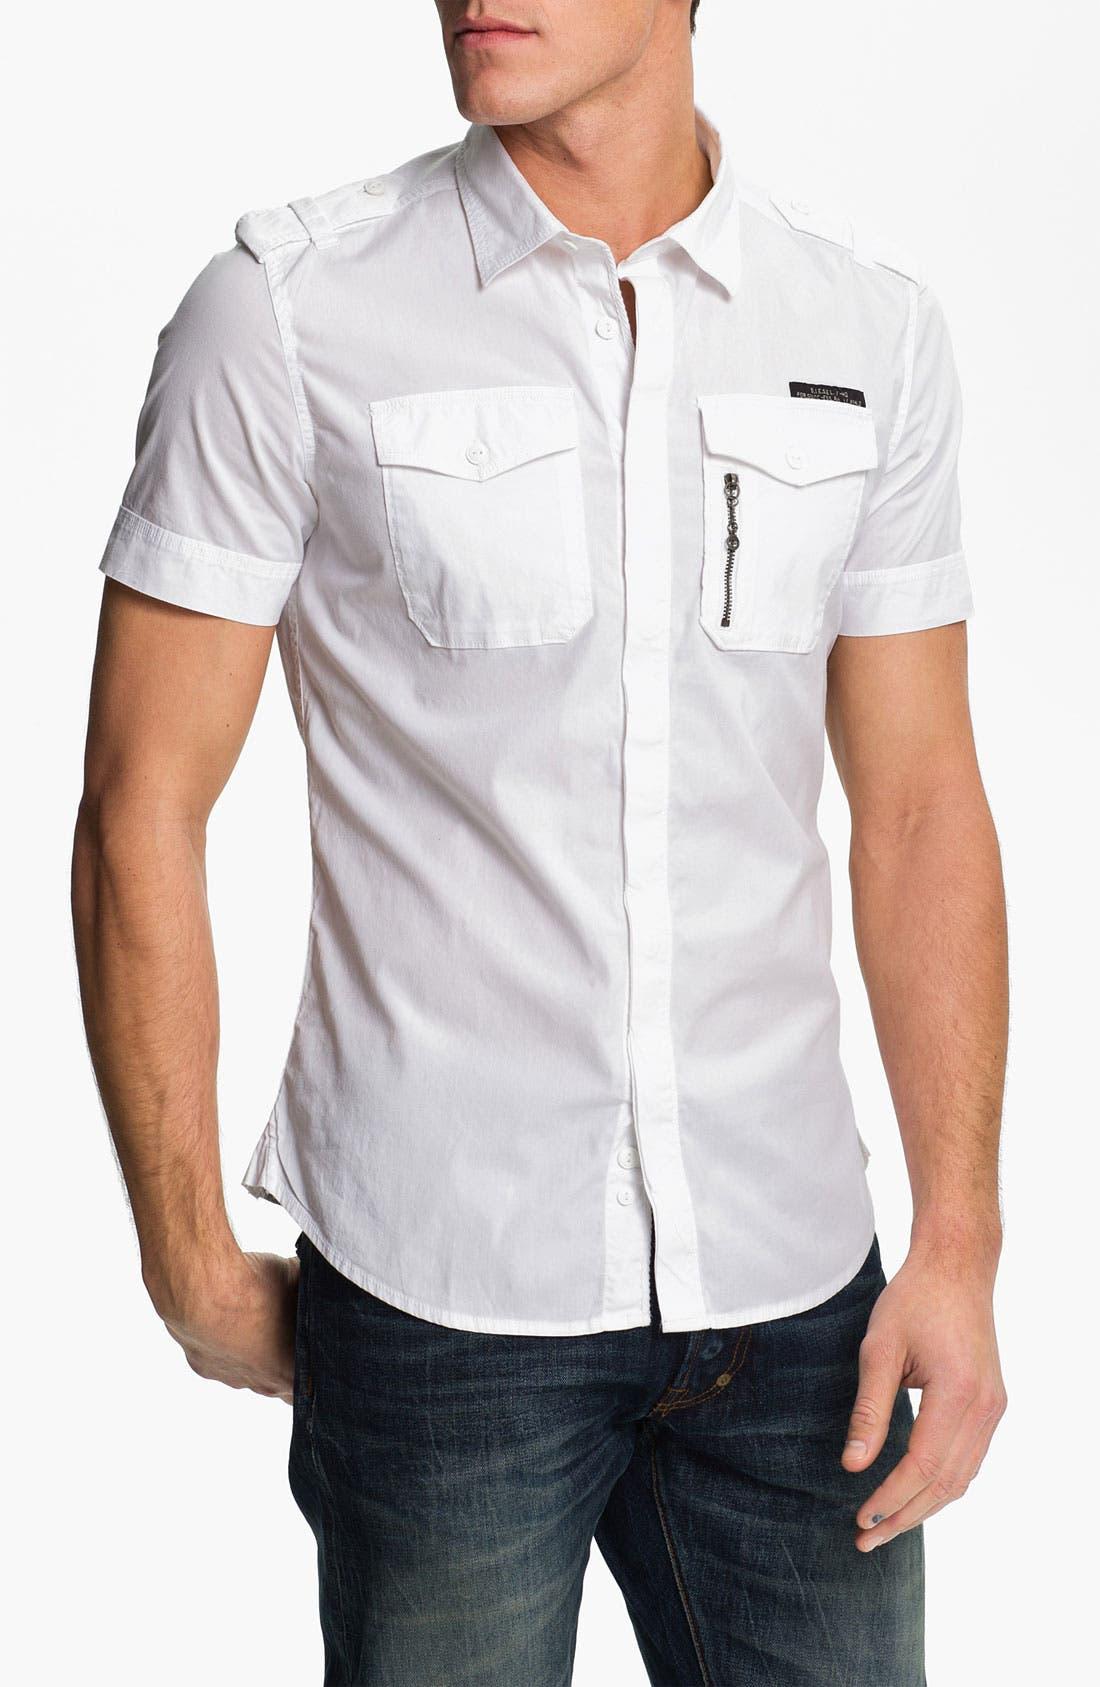 Alternate Image 1 Selected - DIESEL® 'Stombol' Woven Shirt